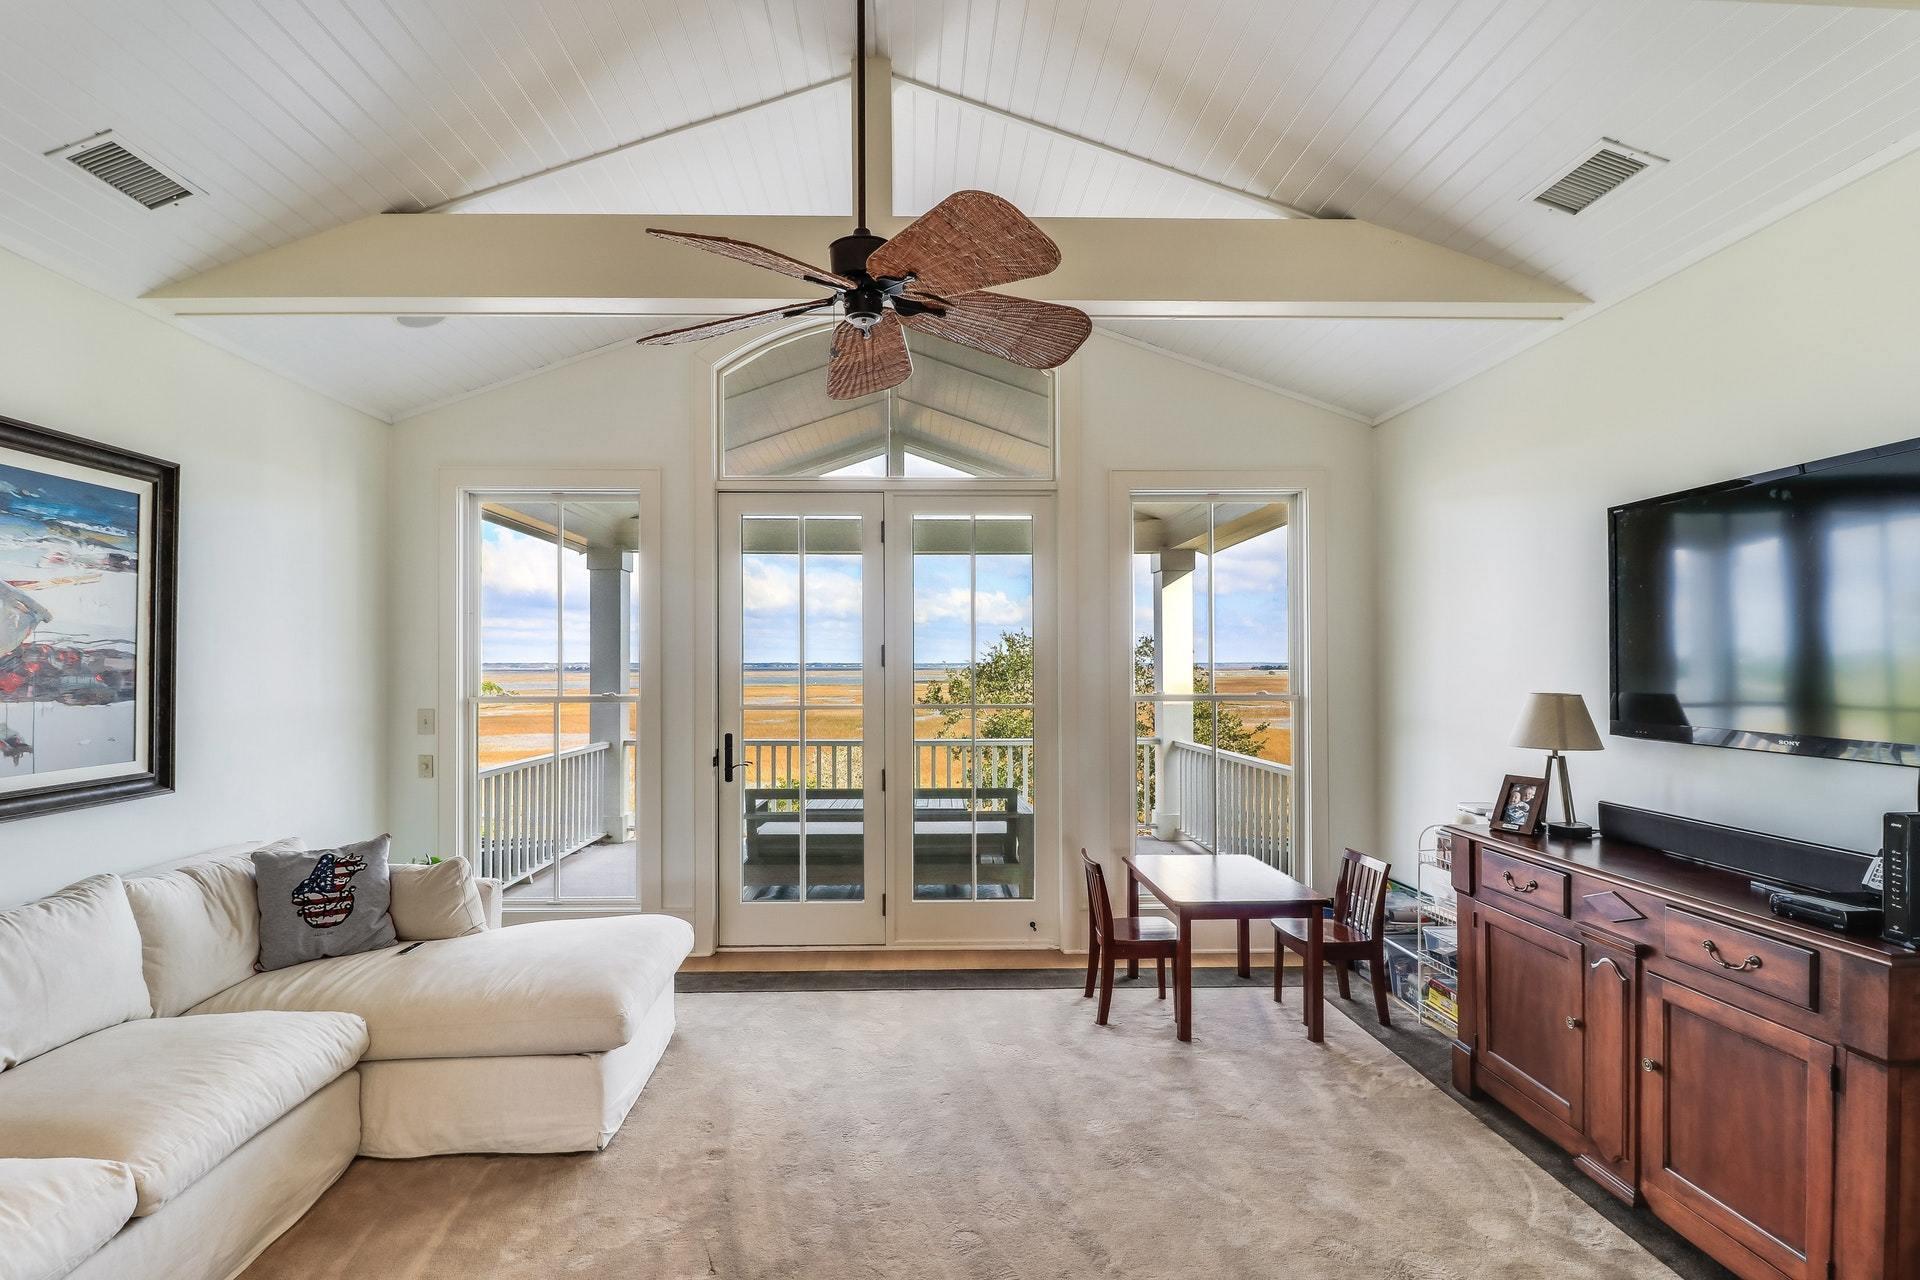 Waterway Island Homes For Sale - 7 Waterway Island Drive, Isle of Palms, SC - 33